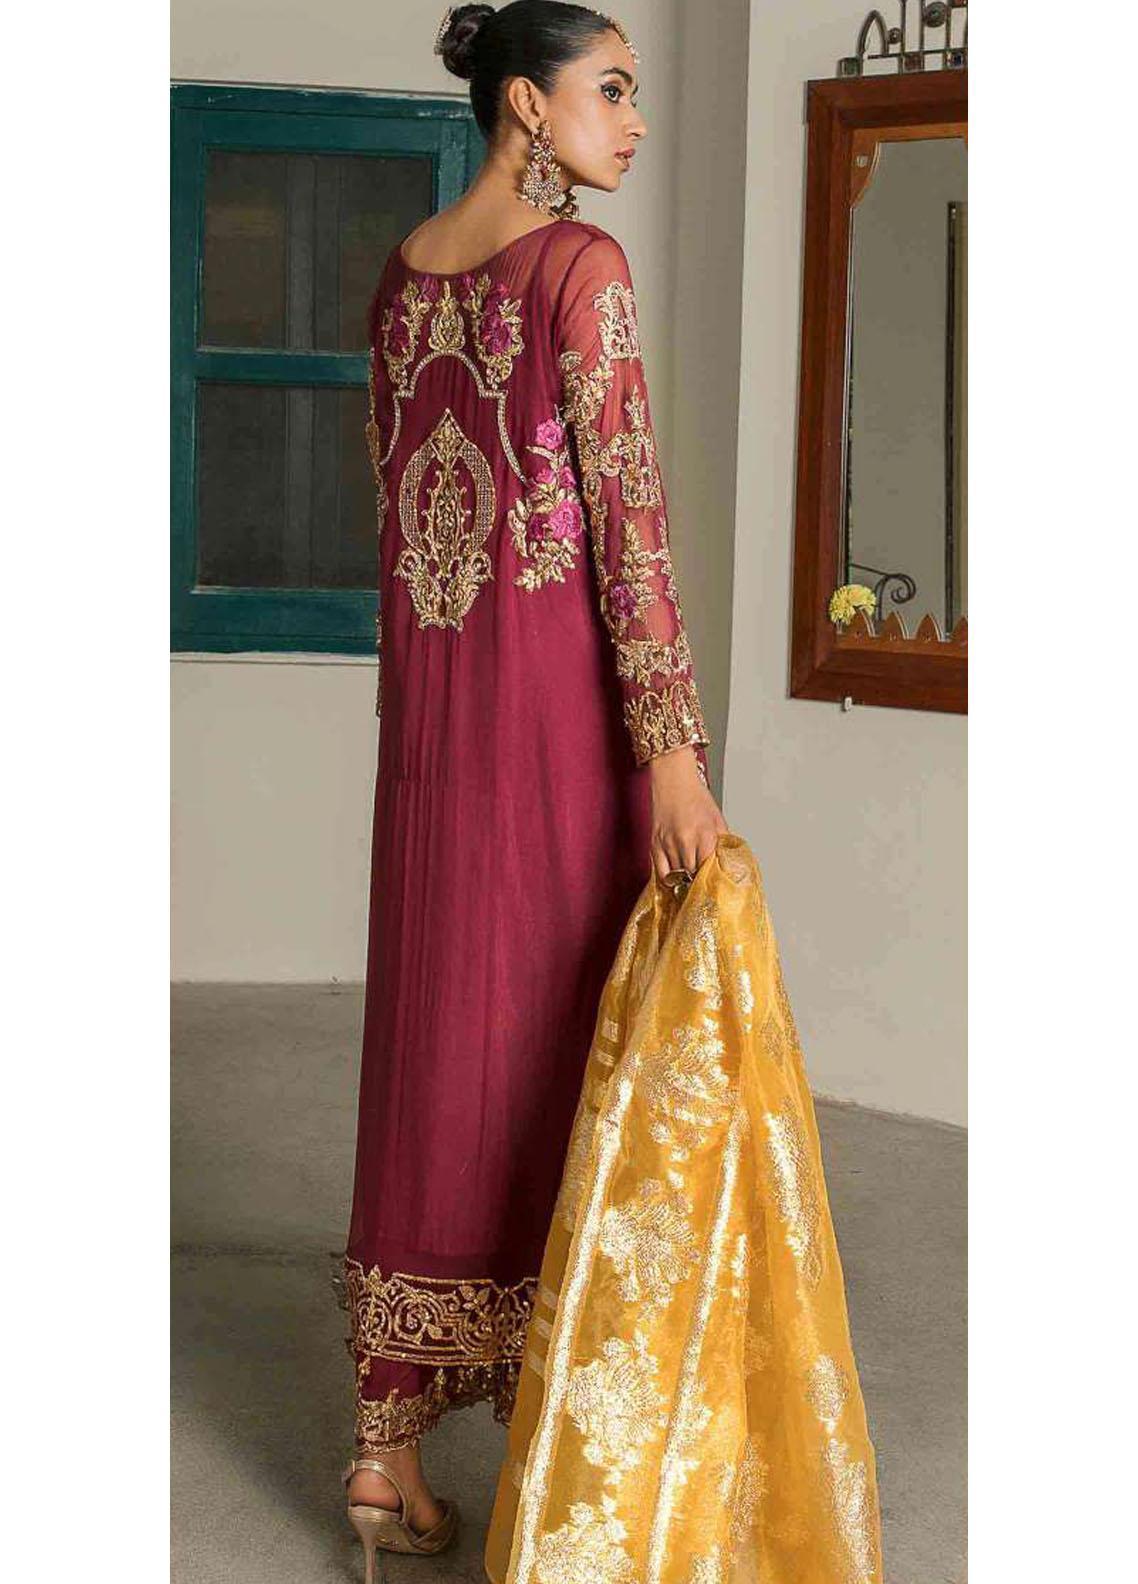 Suraj Garh by Imrozia Premium Embroidered Chiffon Suit Unstitched 3 Piece I-144 ROSHINA – Wedding Collection